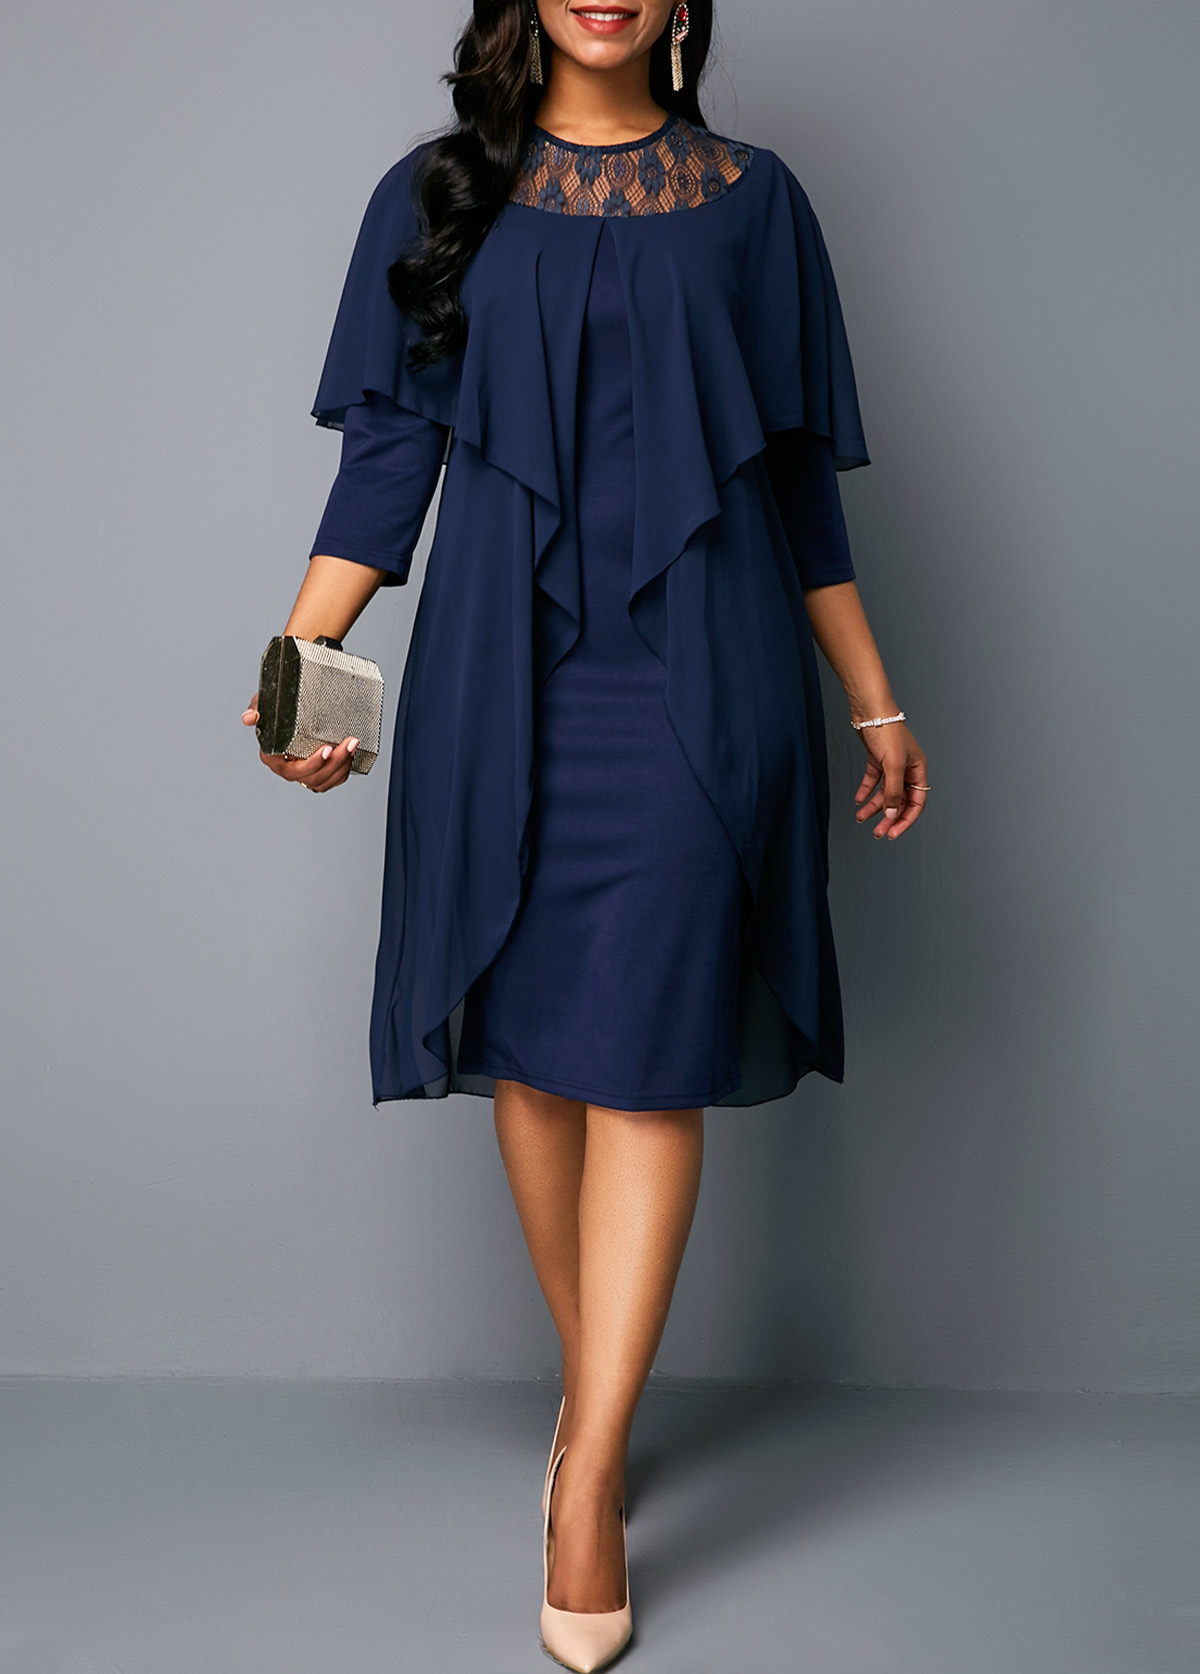 Round Neck Three Quarter Sleeve Chiffon Dress